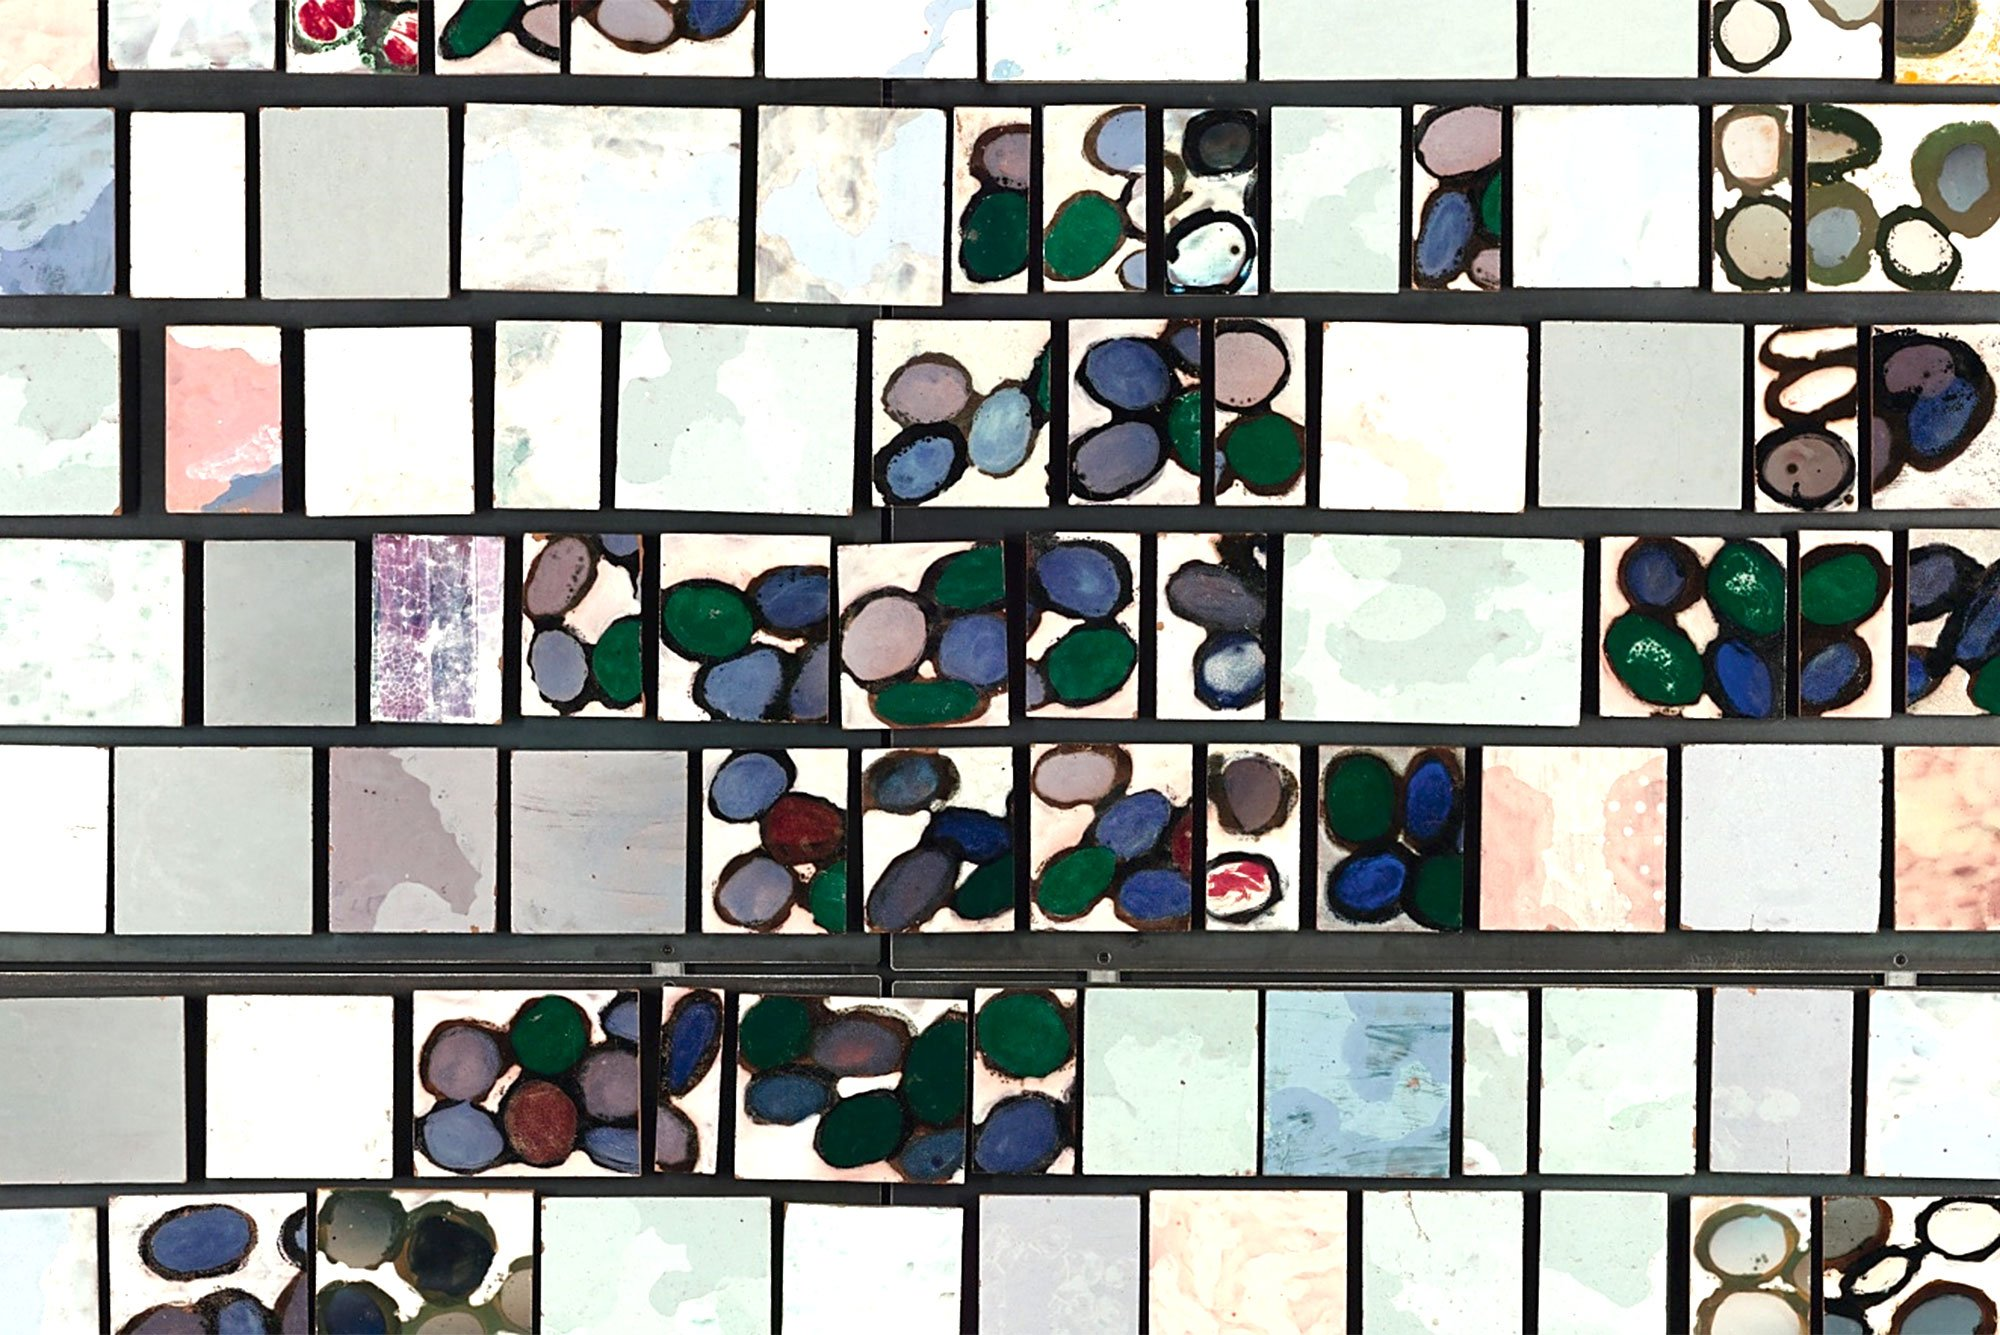 Fausto Melotti |  Enameled polychrome ceramic tiles